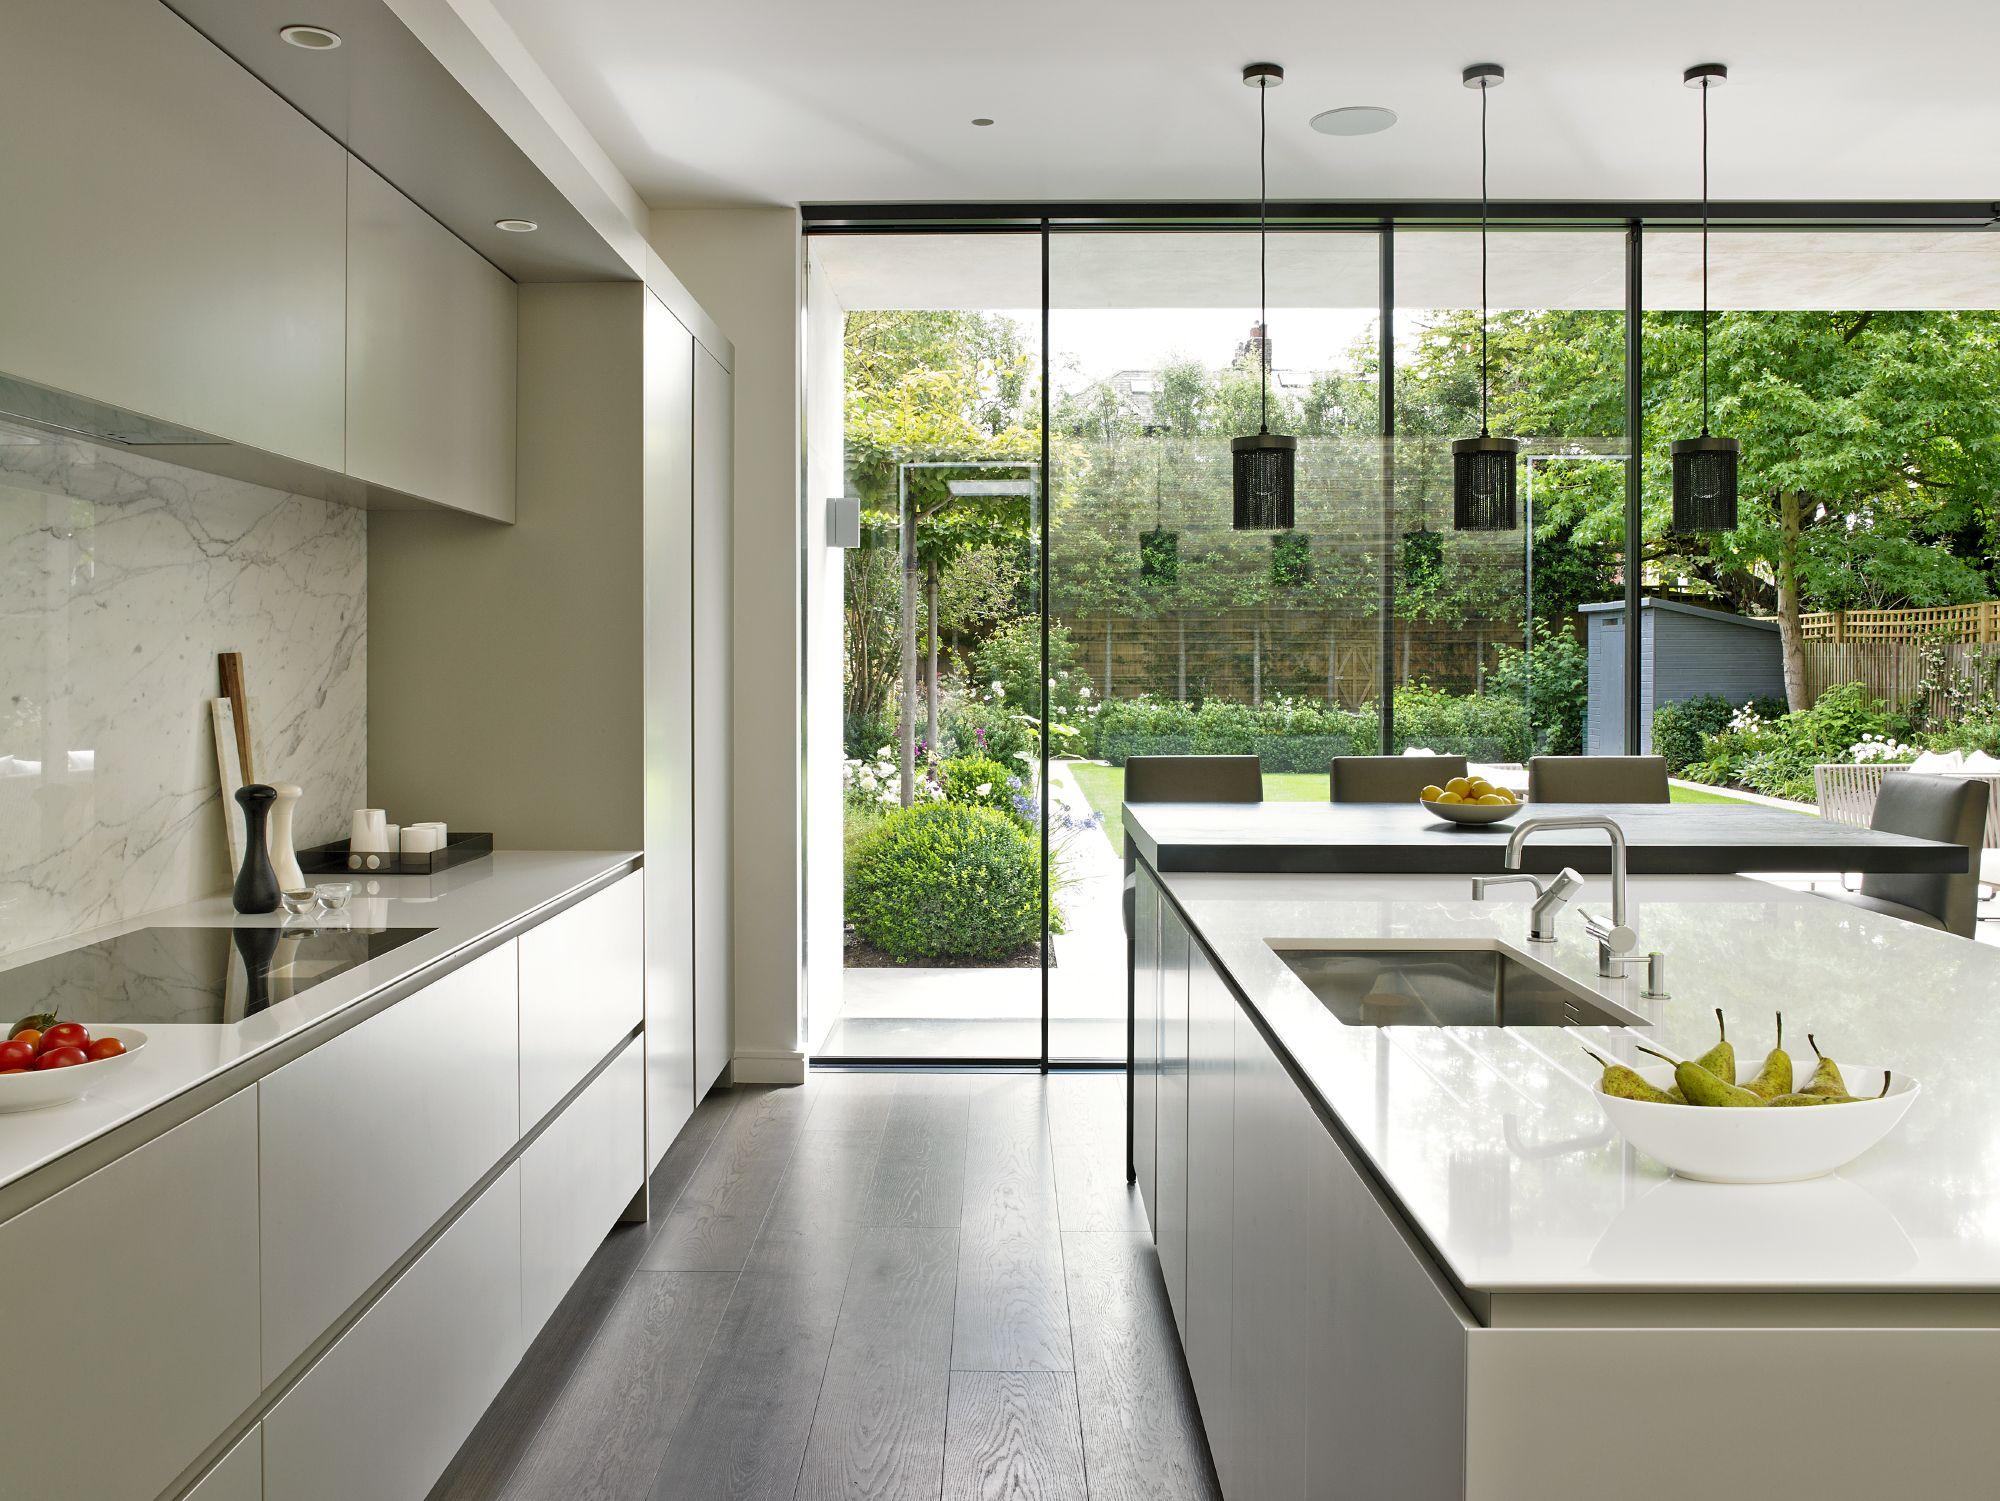 Related image kitchen pinterest undermount sink kitchen doors